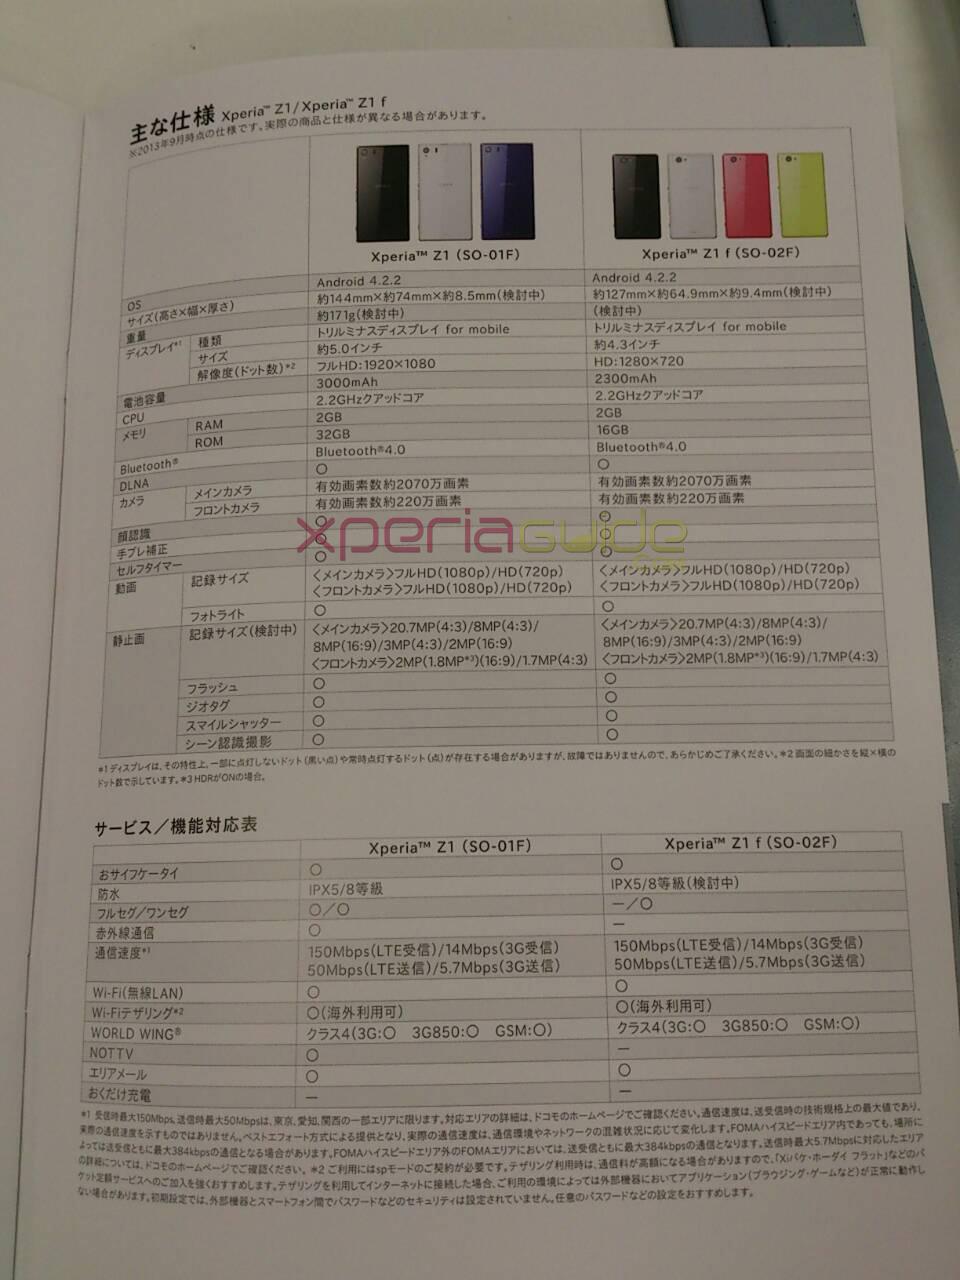 Xperia Z1 (SO-01F), Xperia Z1 f (SO-02F) aka Xperia Homami Mini Leaked specs